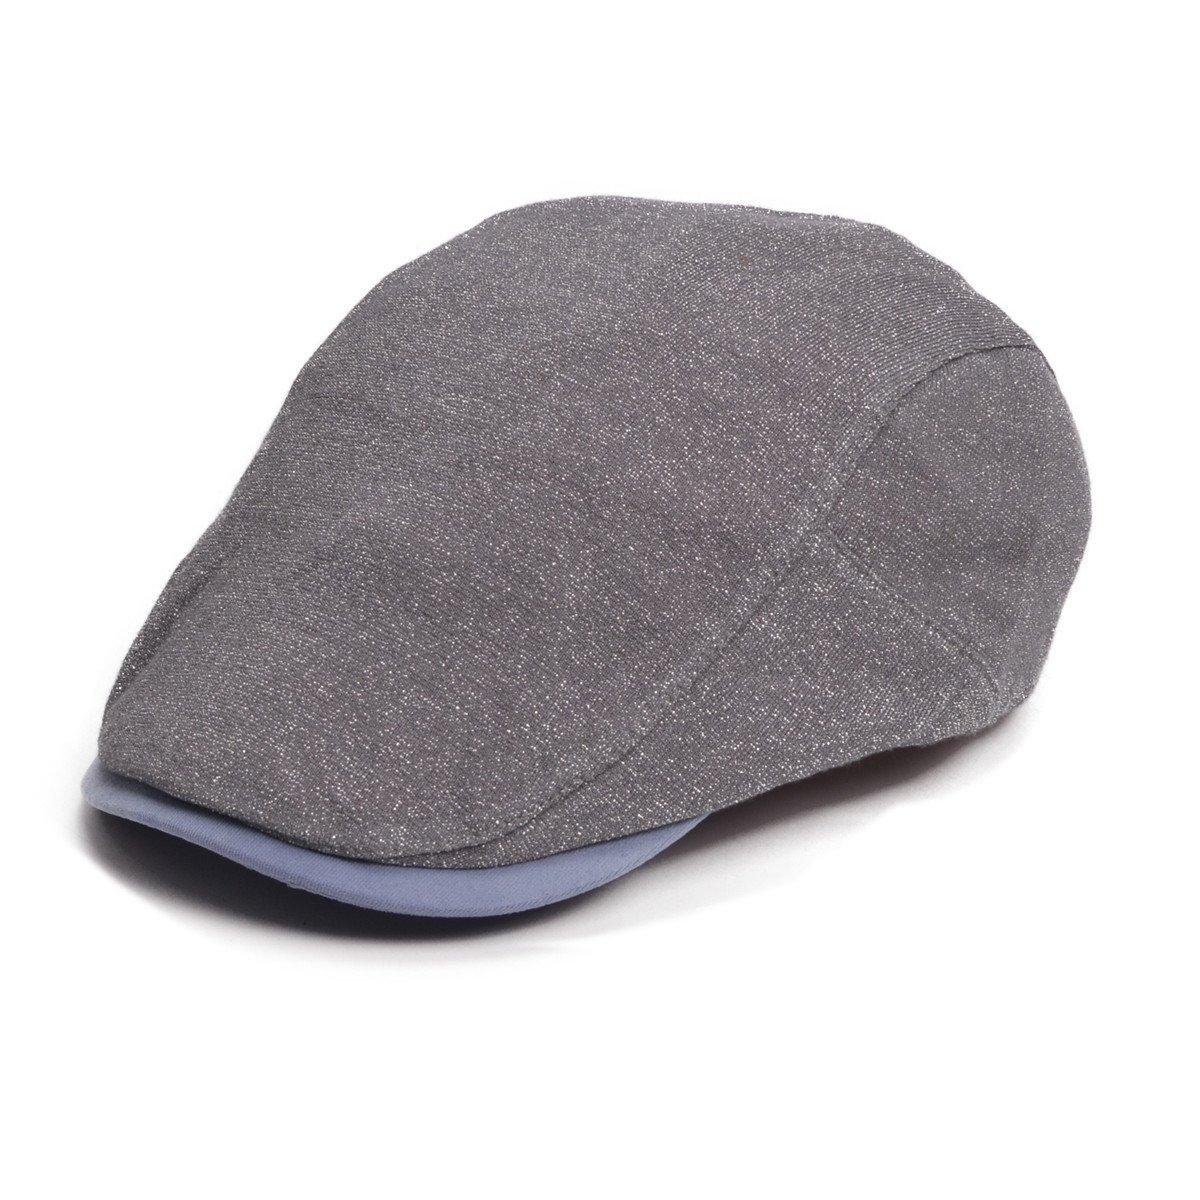 Lawliet Unisex Solid Color Cabbie newsboy Ascot IVY Gatsby Hat Cap T260